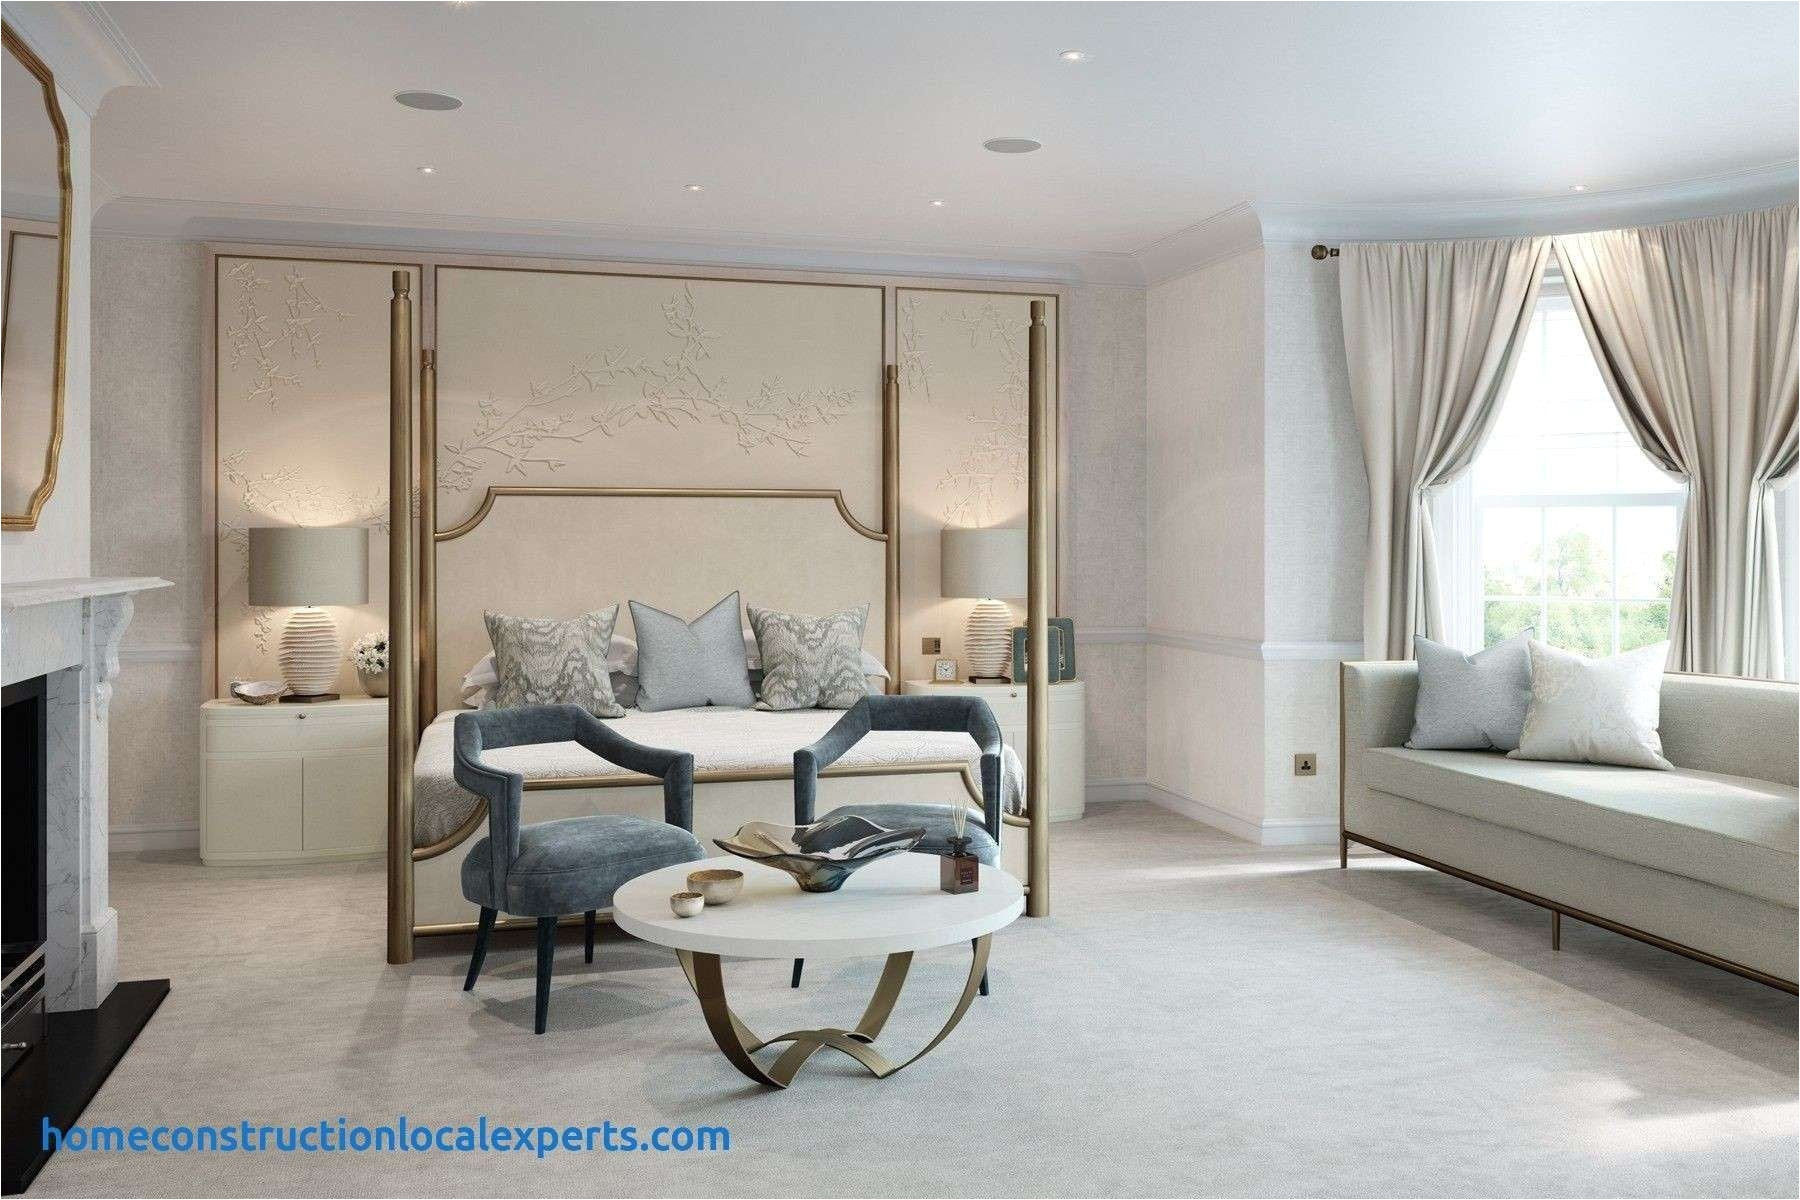 bedroom 50 beautiful bedroom apartments in cincinnati bedroom apartments in cincinnati inspirational 39 new cool